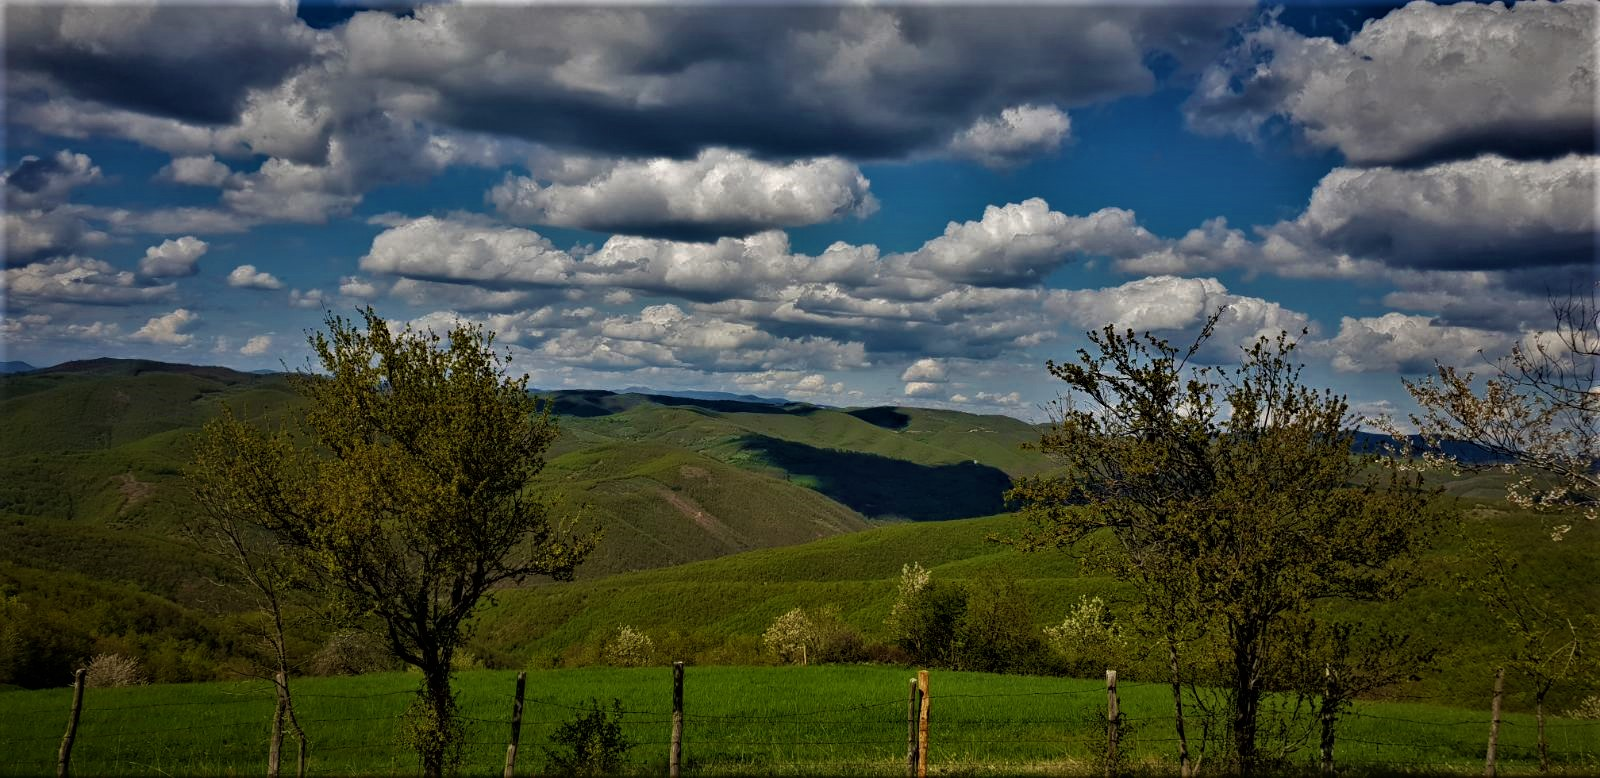 balkandestination countryside kosovo